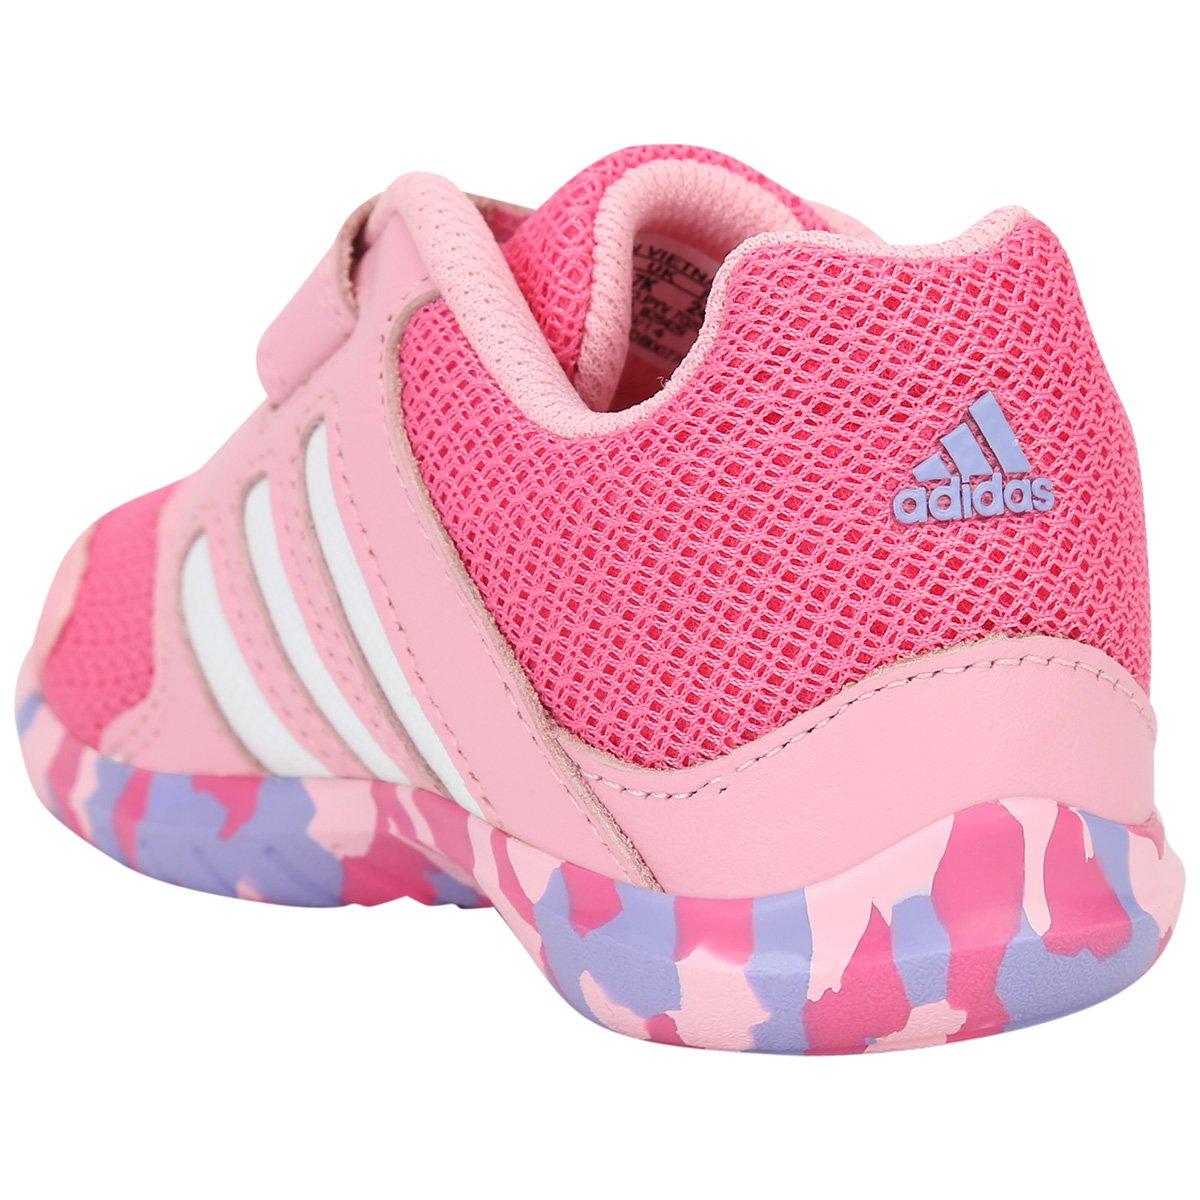 Tênis Adidas Katnat 2 AC Infantil - Compre Agora  c09bd1d628b12